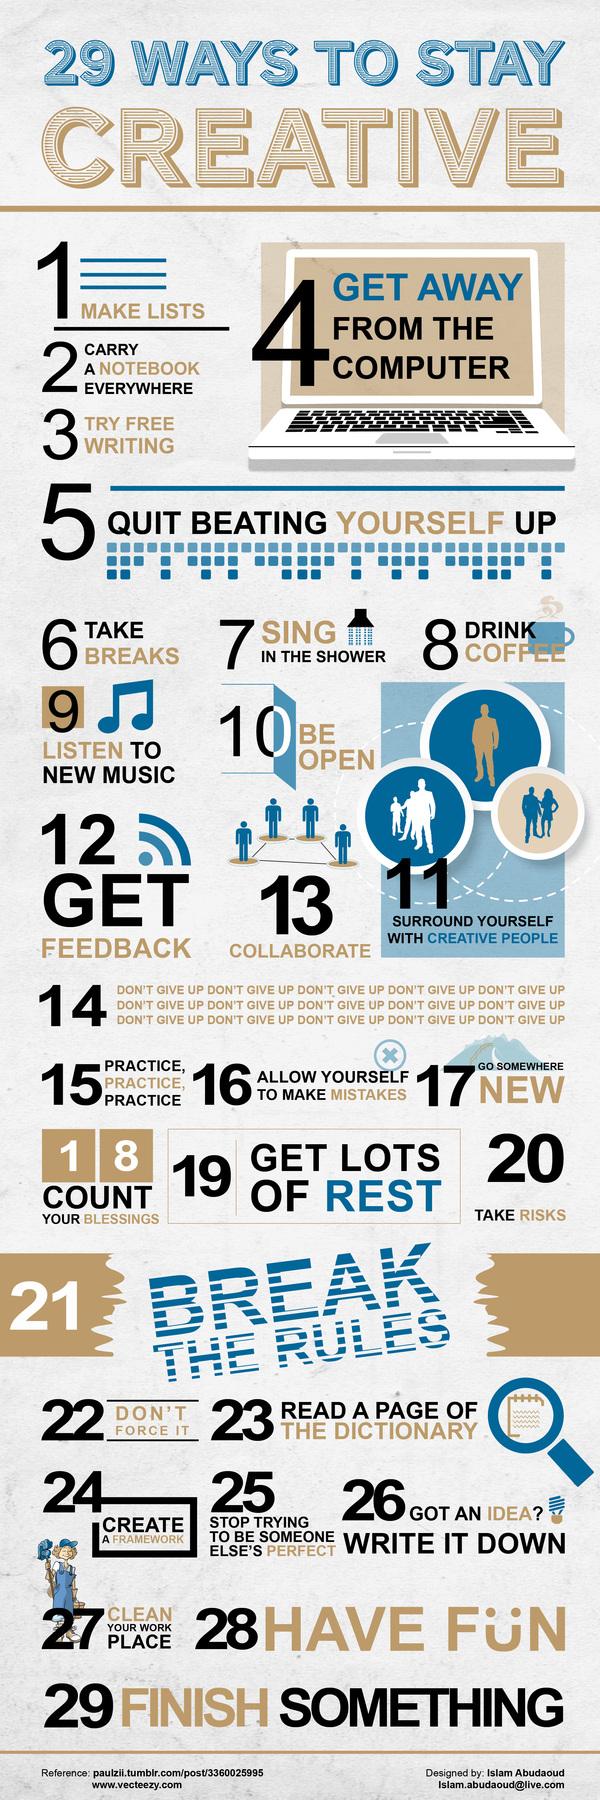 29 maneras de permanecer creativo